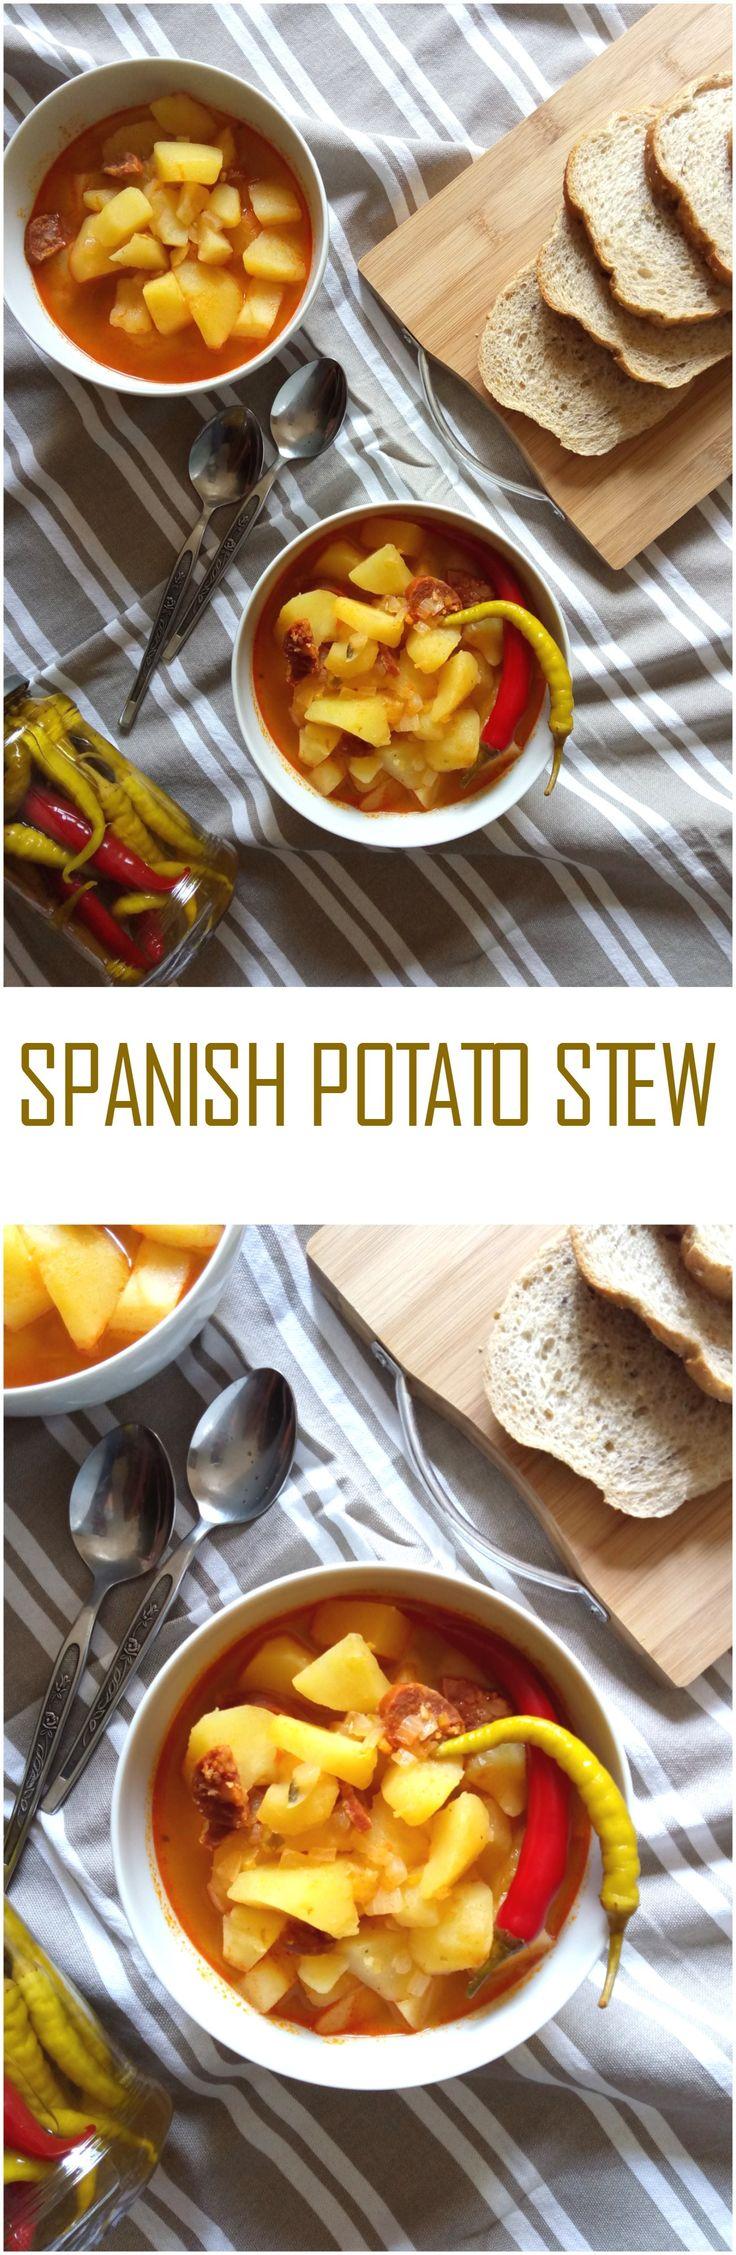 Spanish Potato Stew (Patatas a la Riojana) #potatostew #spanishfood